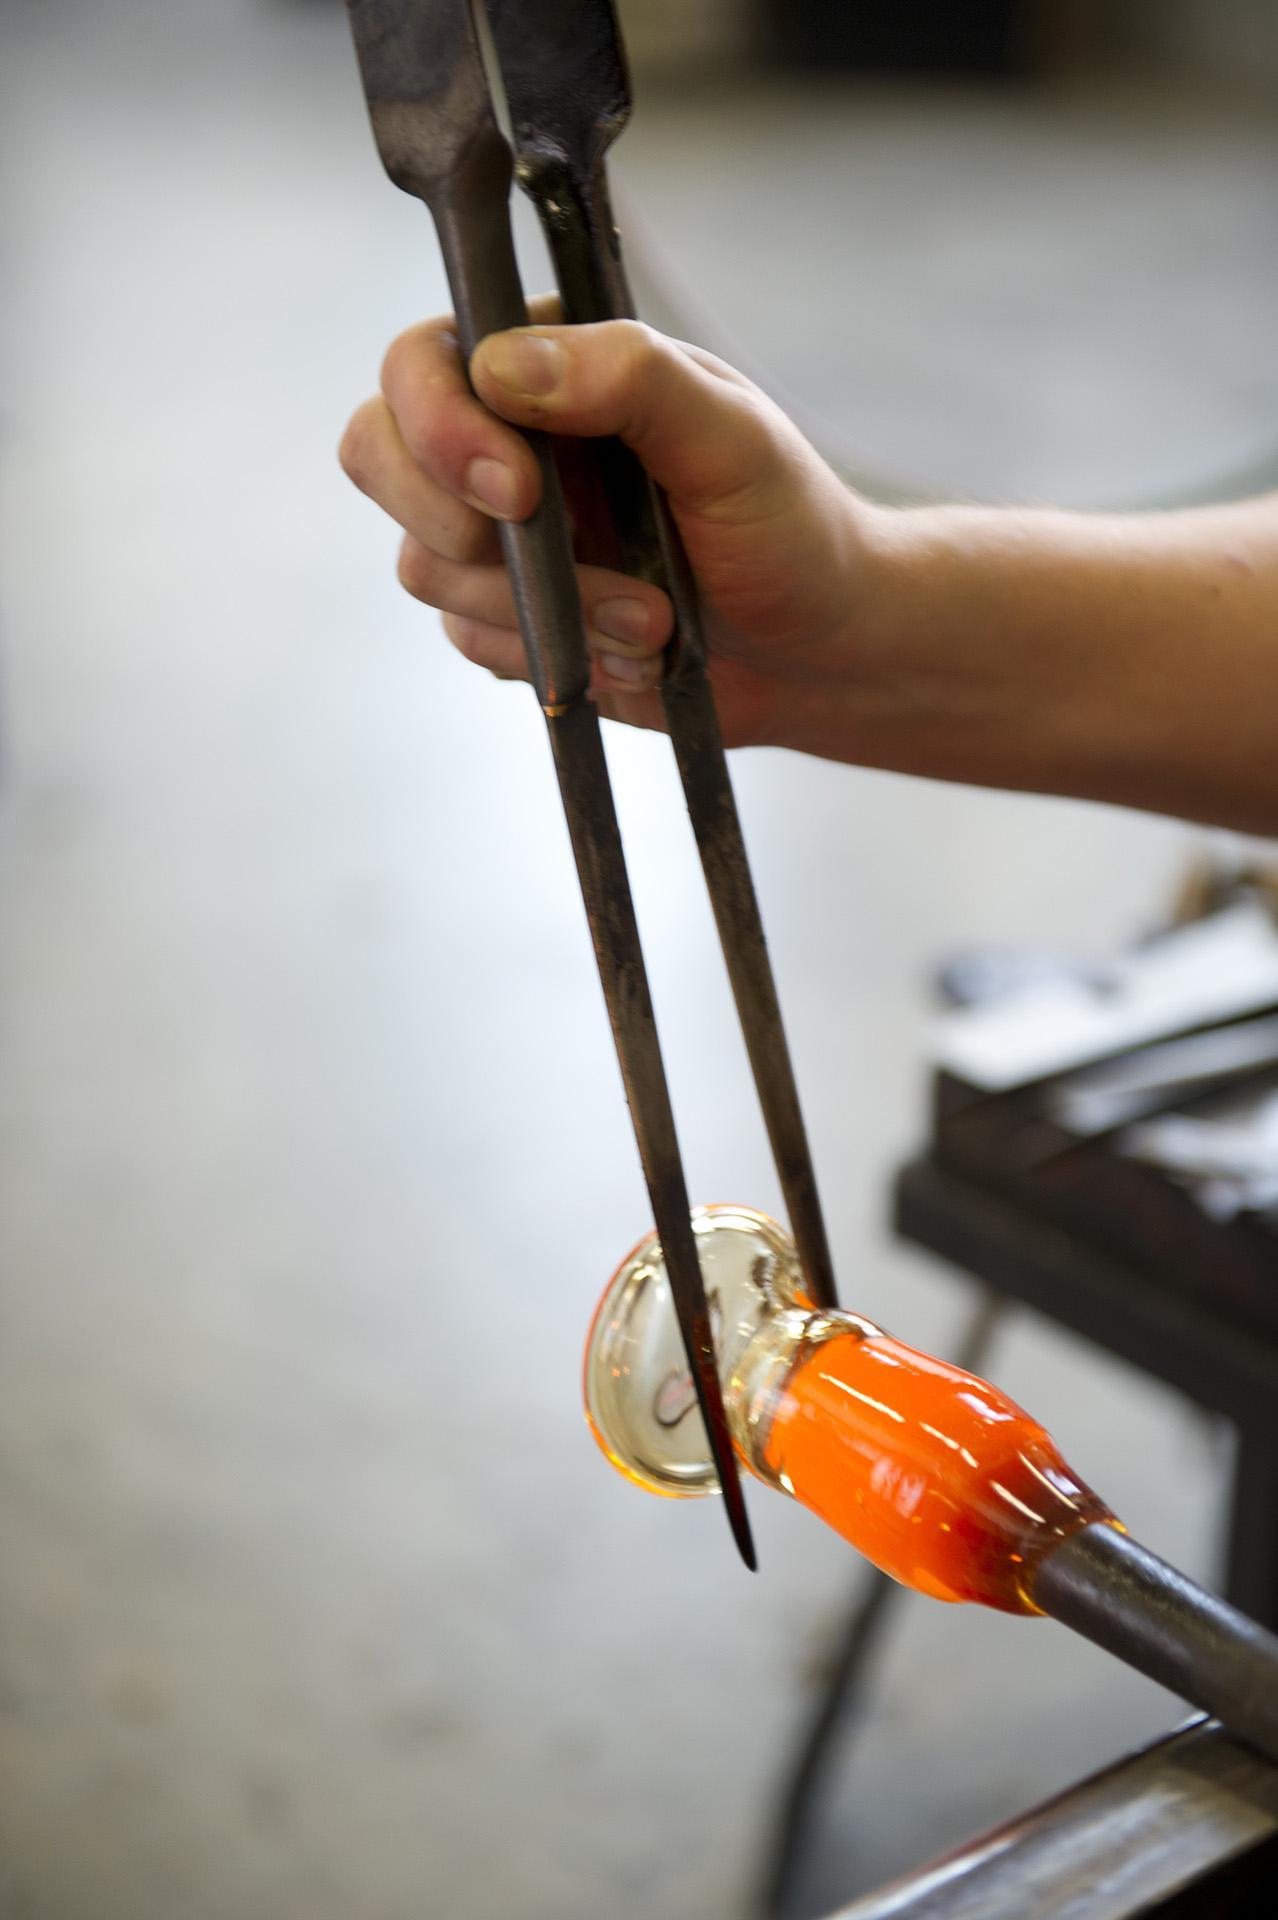 Artist shaping hot class using metal tools